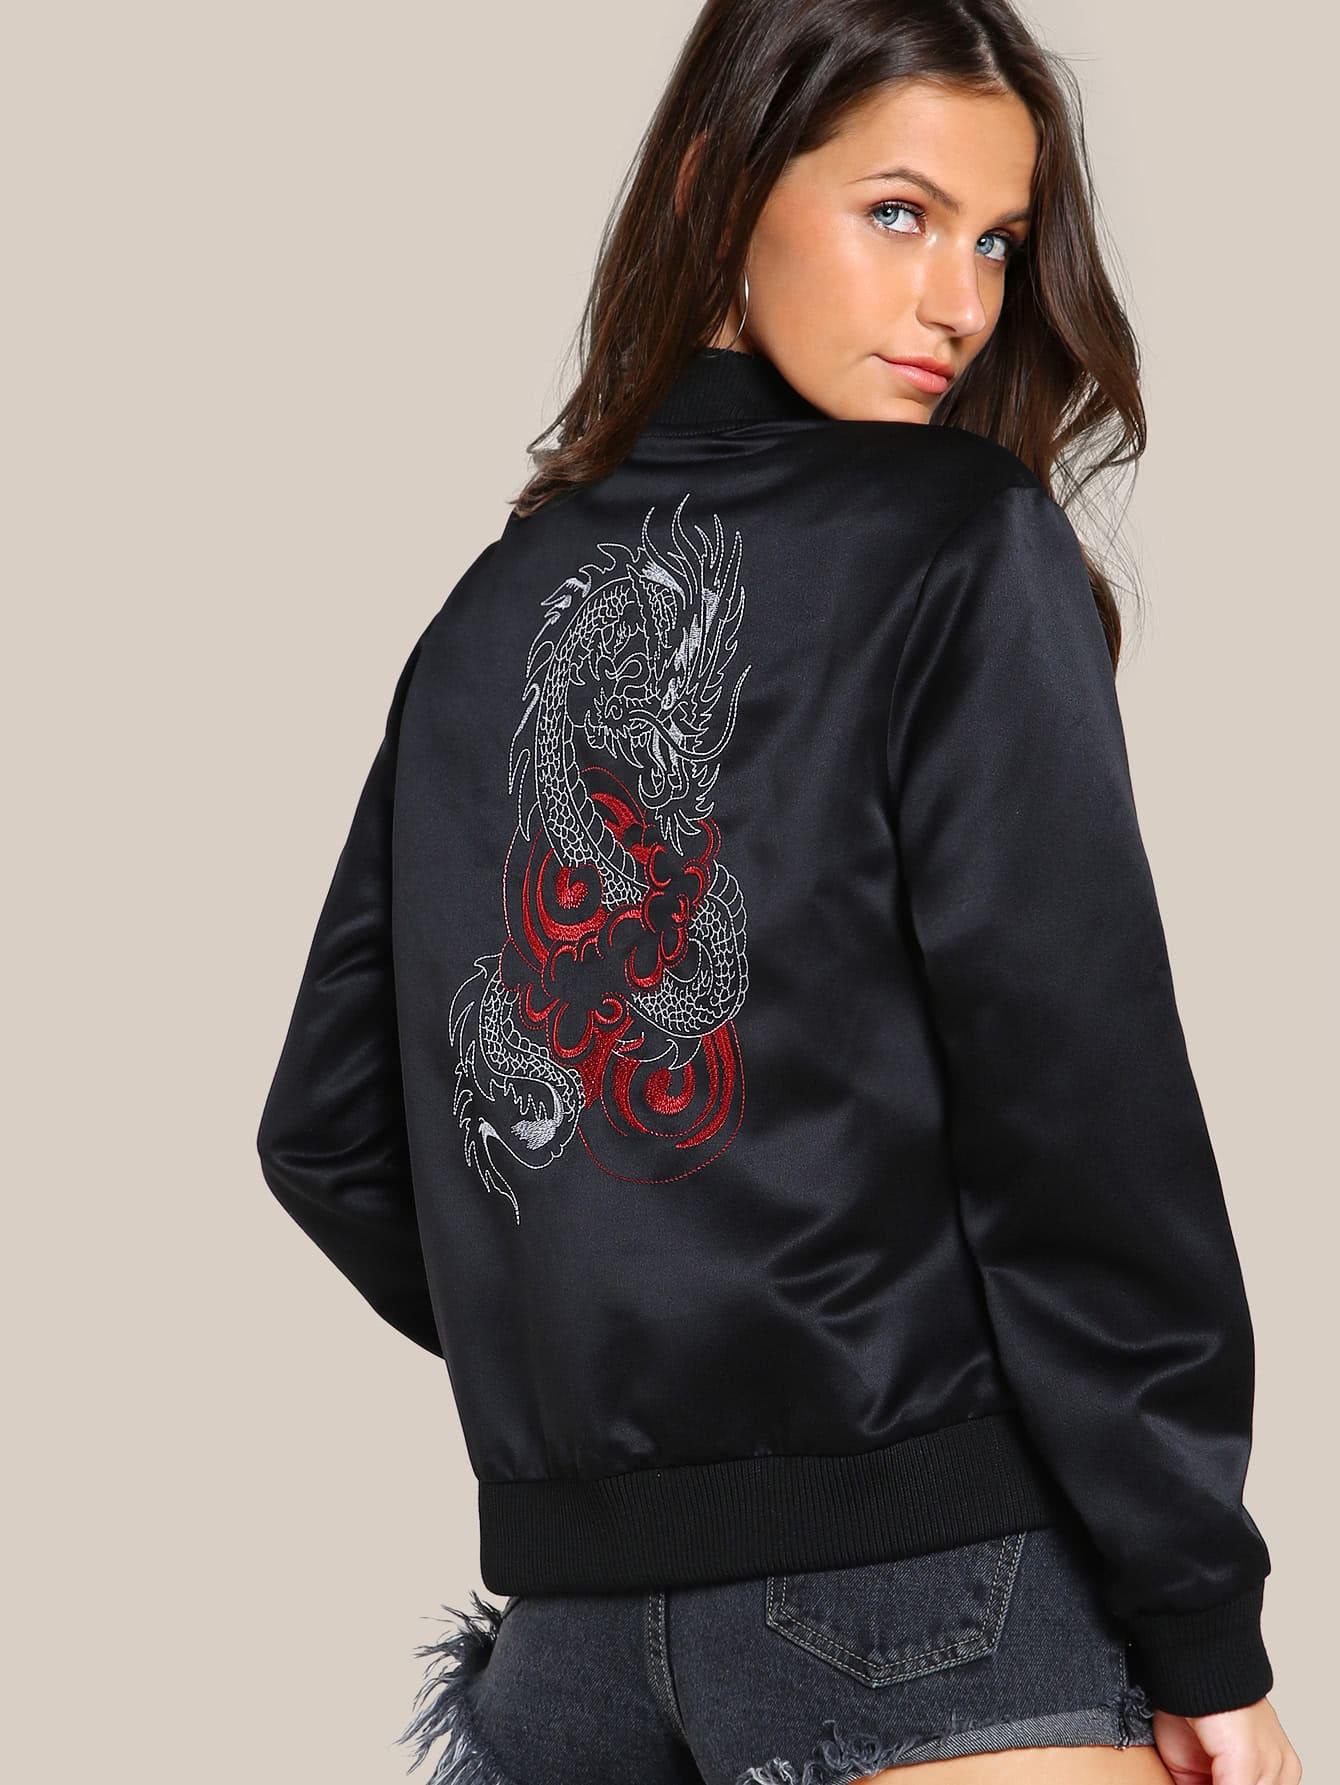 Dragon embroidered back bomber jacket makemechic